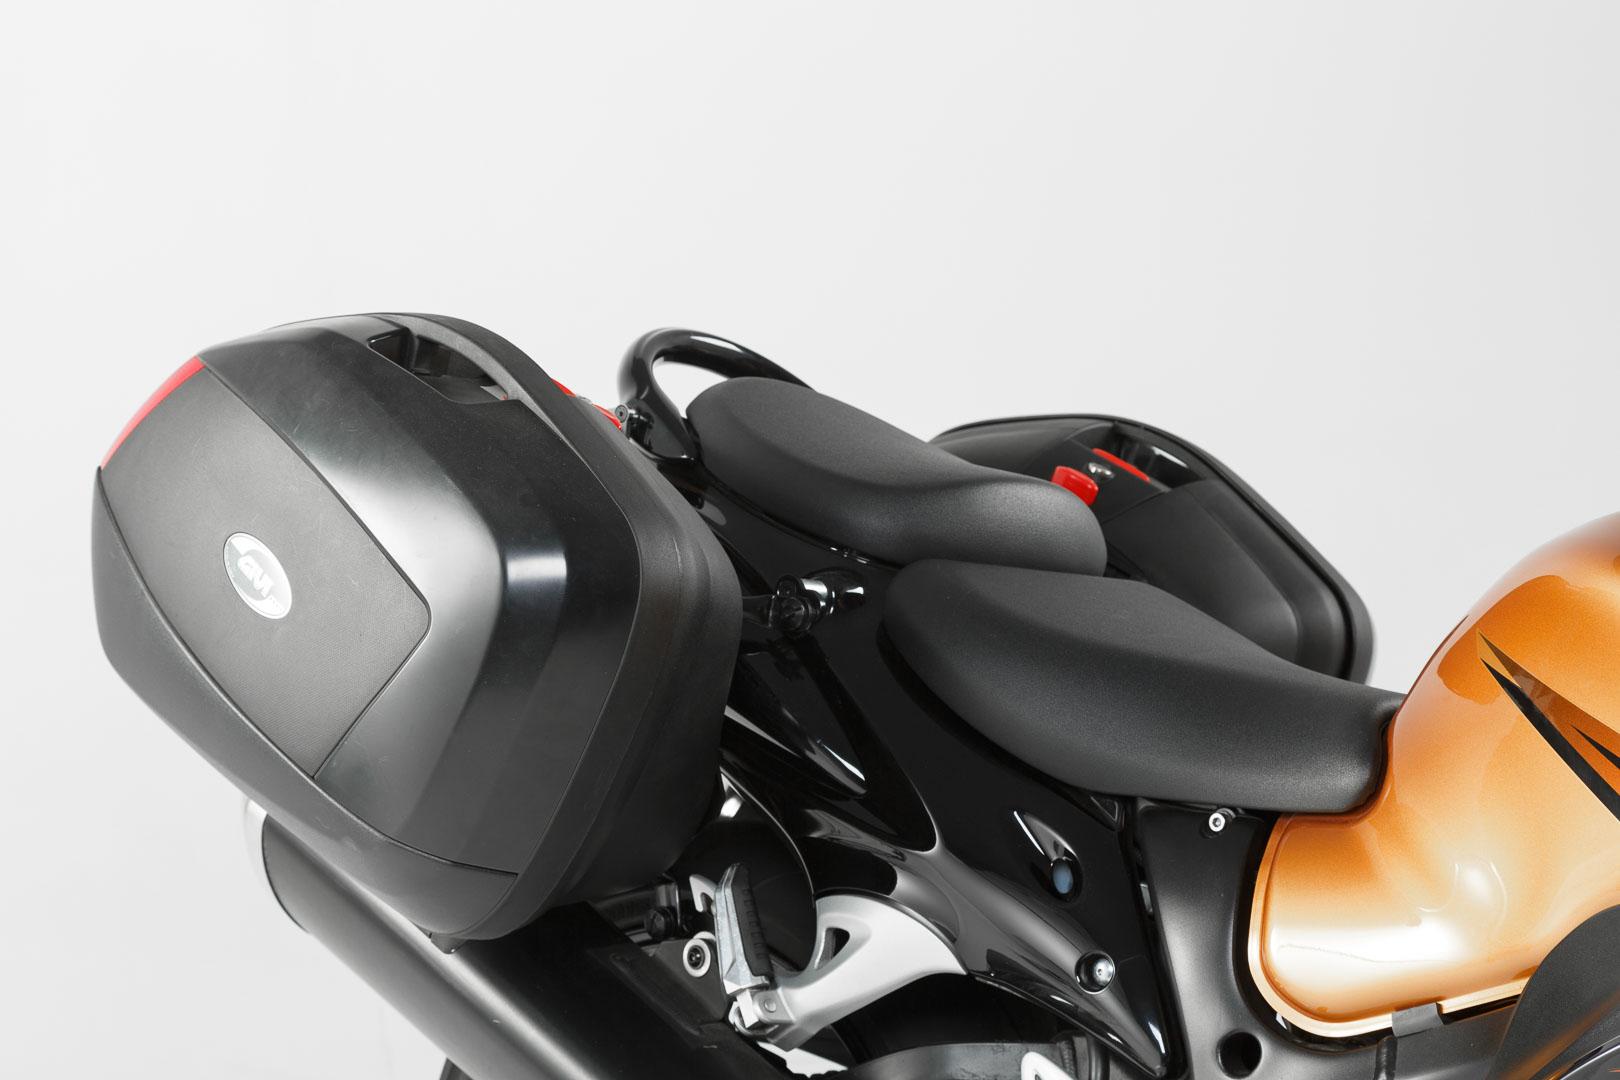 Quick-Lock EVO Profile sivutelinesarja Suzuki GSX1300R Hayabusa 08-